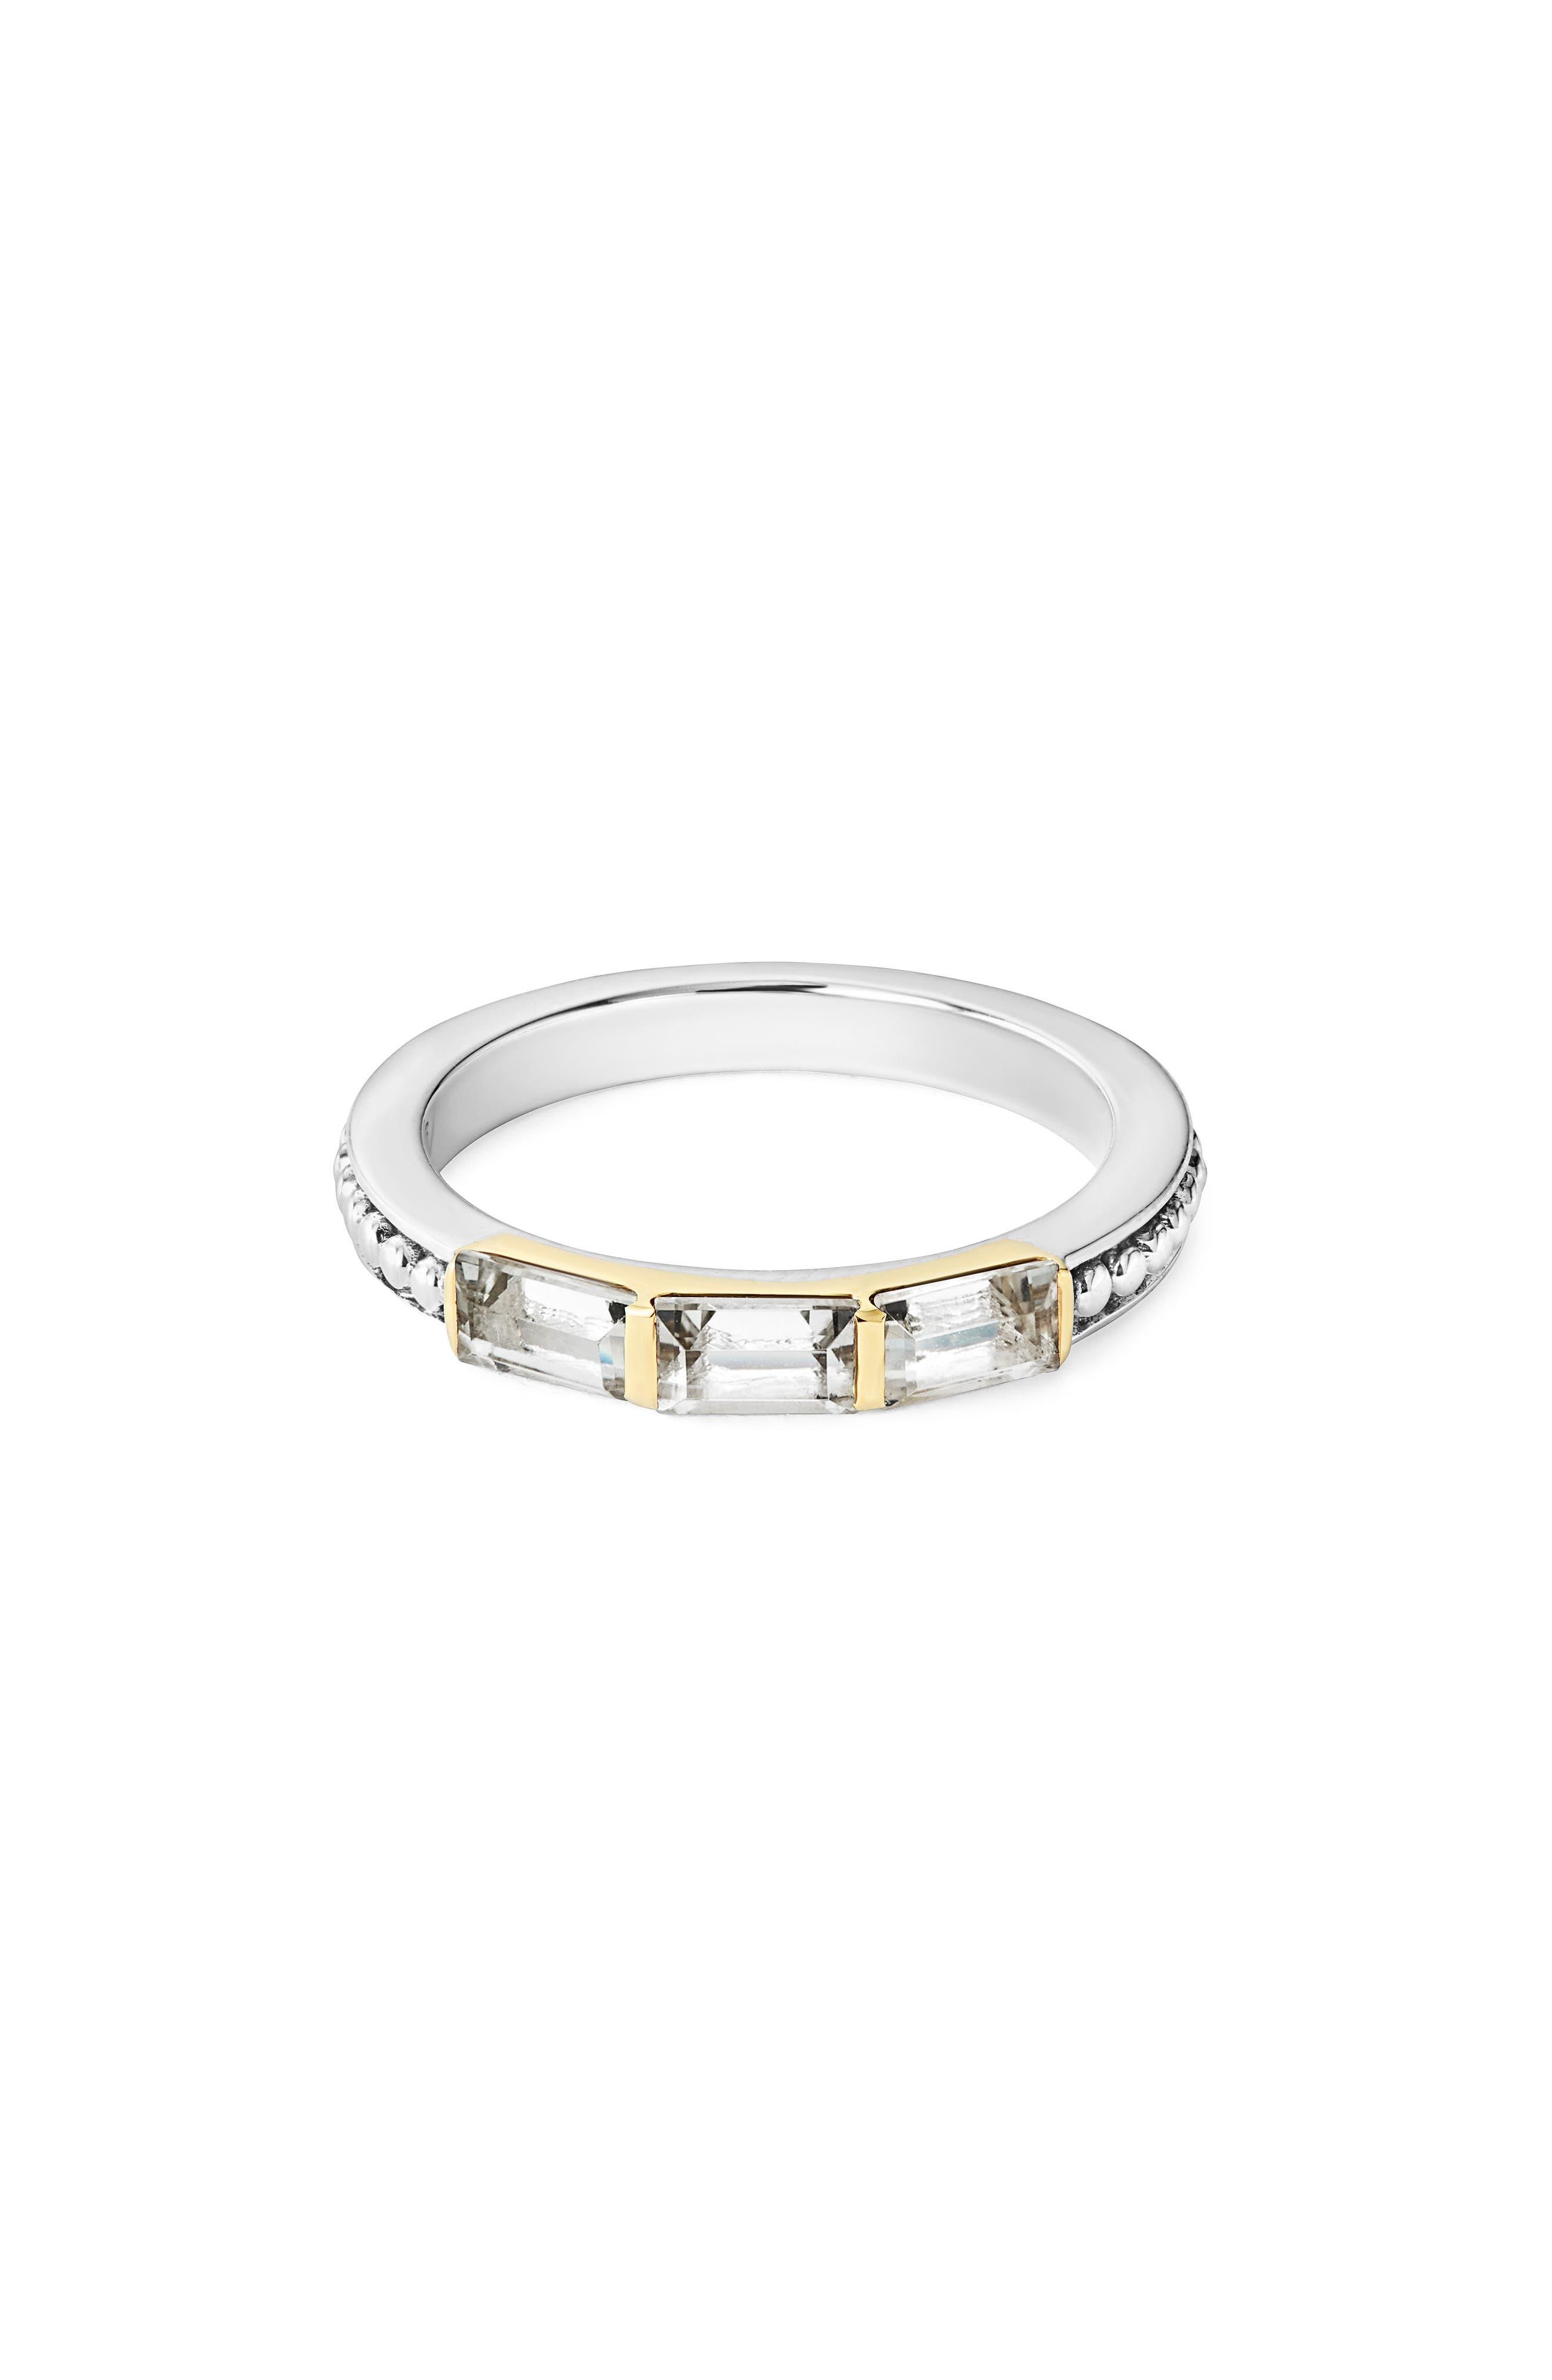 Gemstone Baguette Stackable Ring,                             Main thumbnail 1, color,                             SILVER/ 18K GOLD/ WHITE TOPAZ